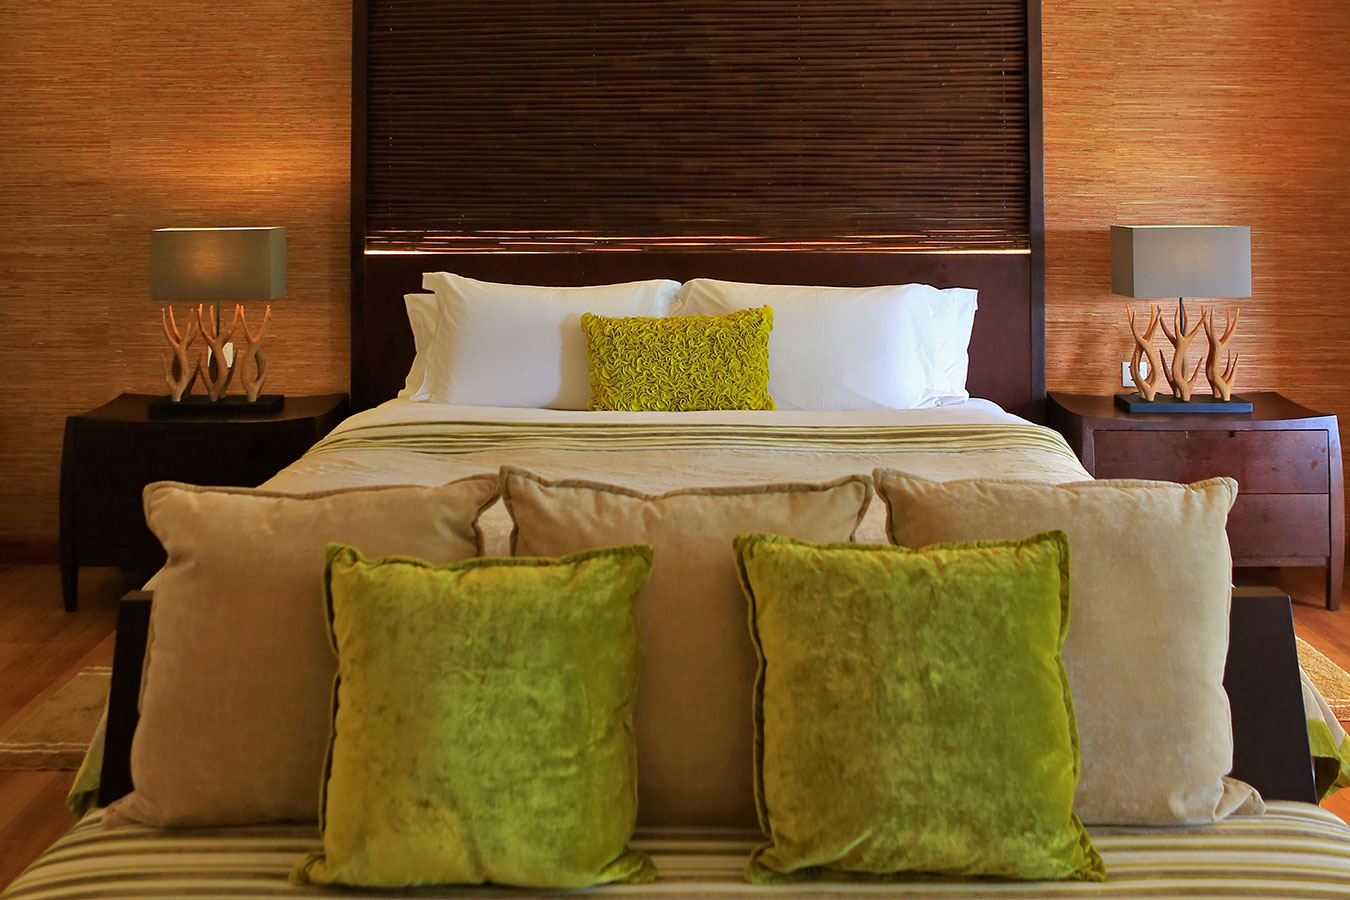 Kurumba Maldives - Family Villa - Bedroom Image - Maldives Resorts